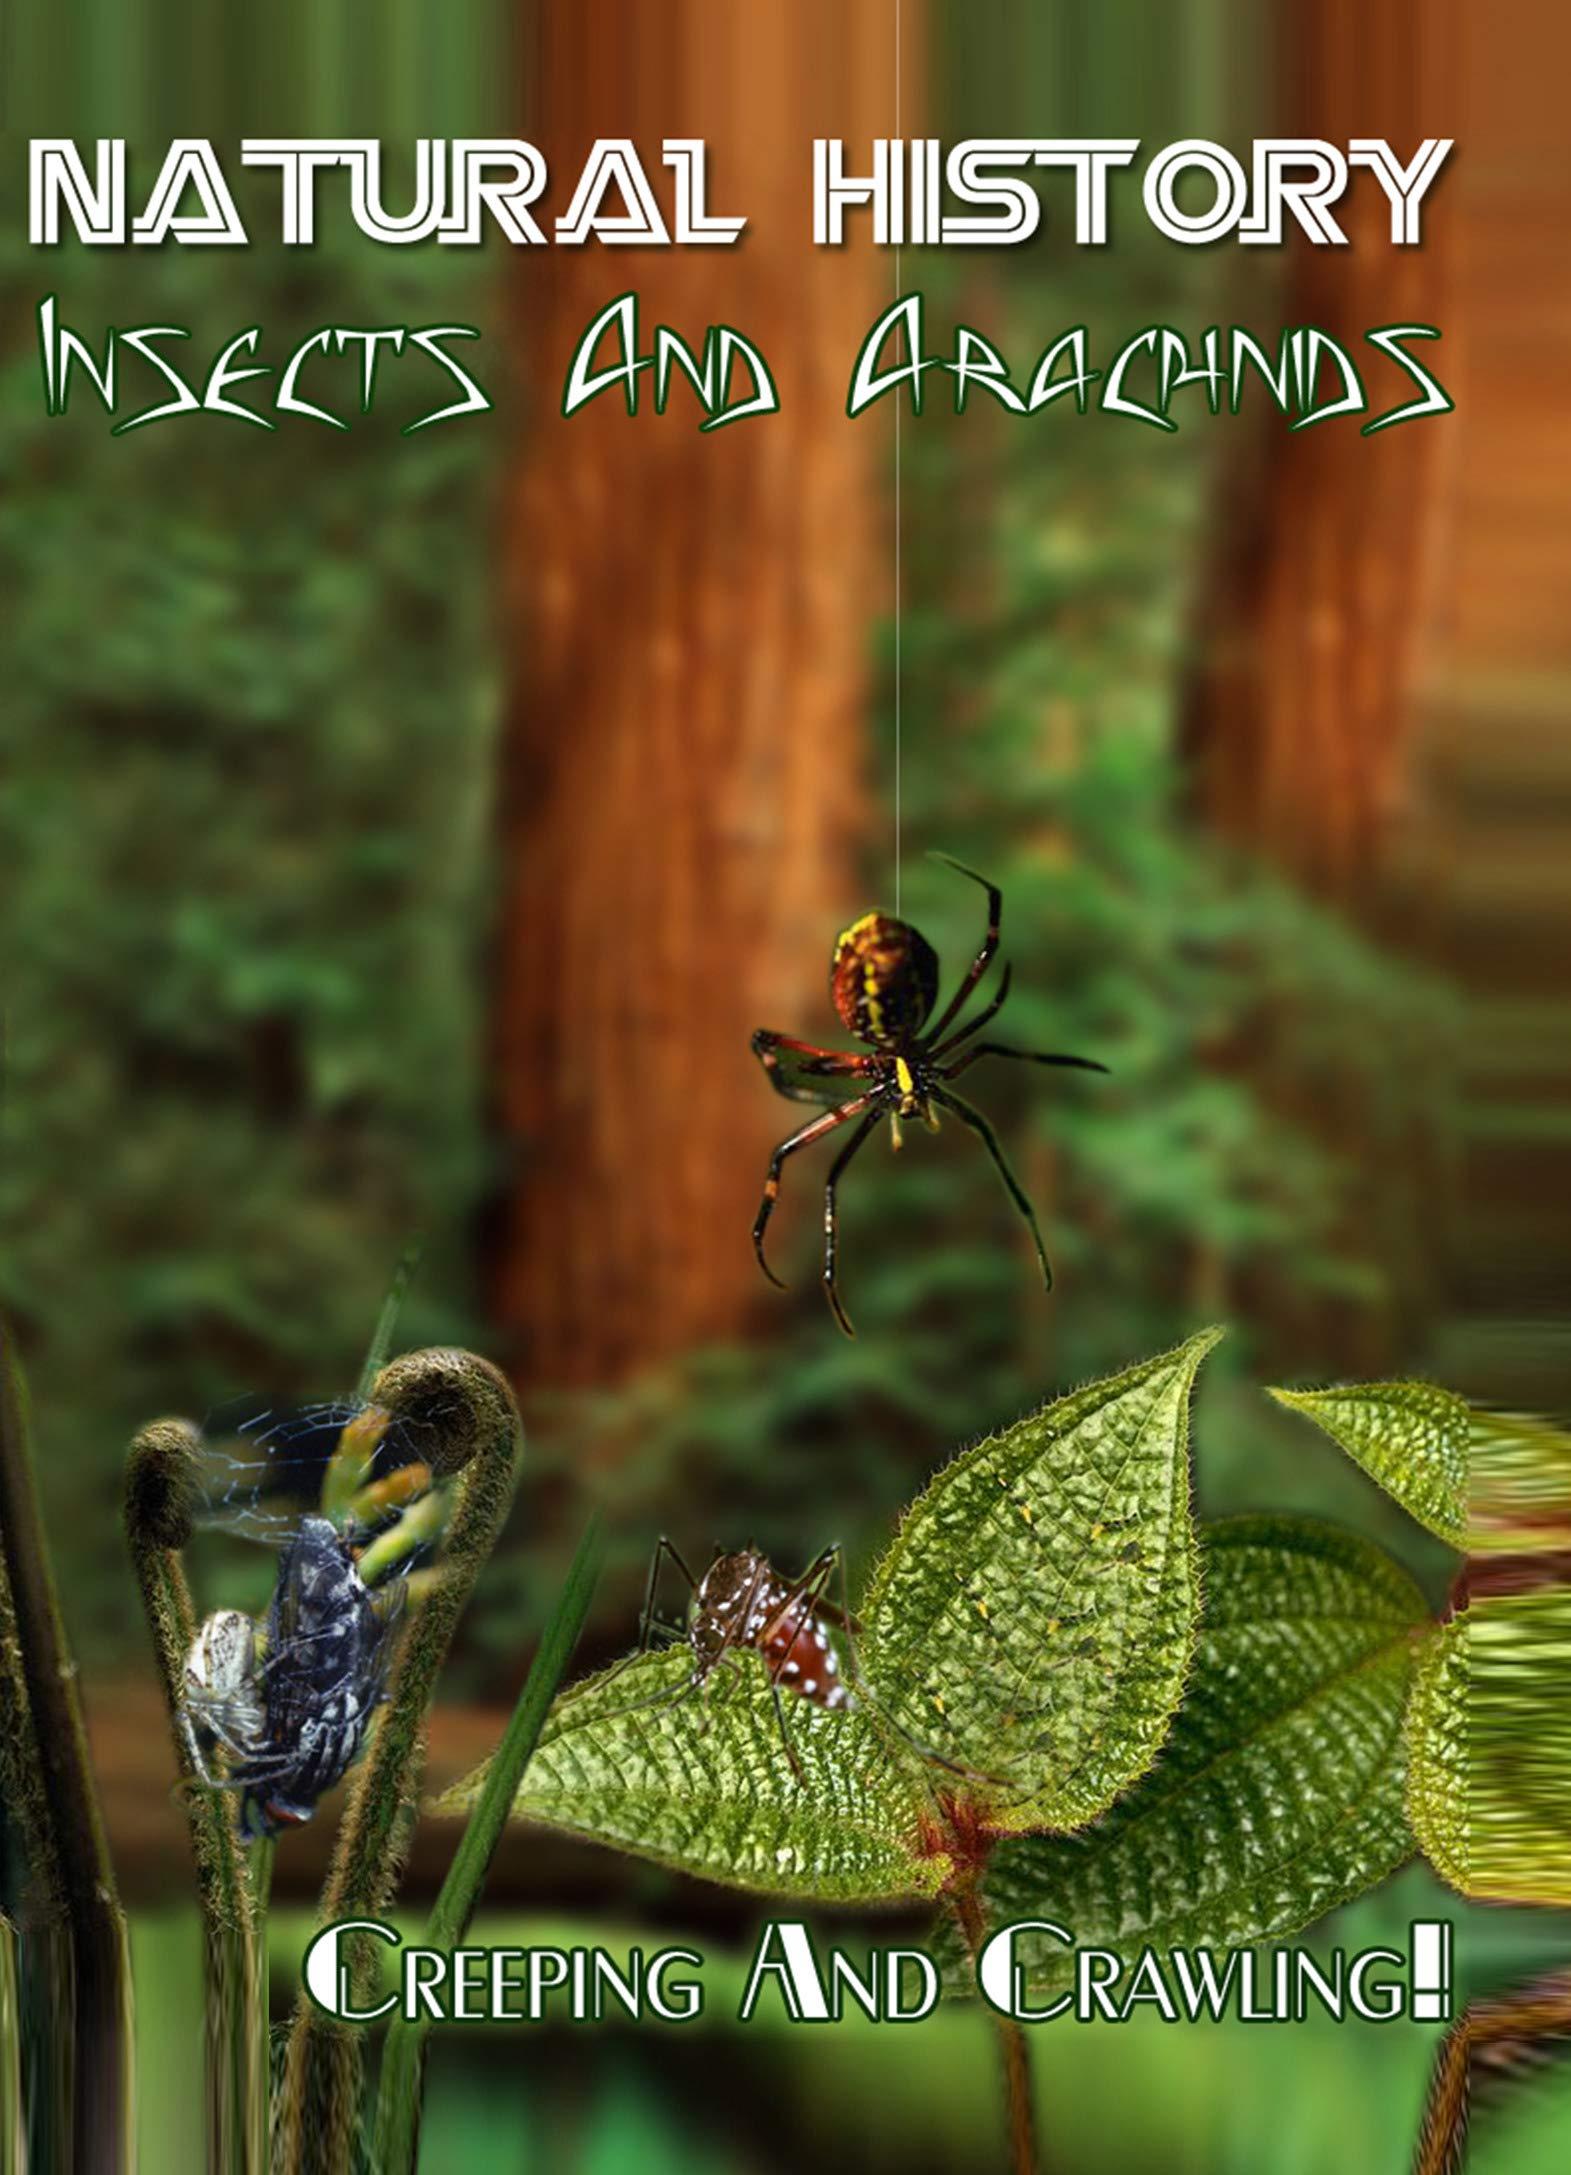 Natural History - Insects And Arachnids Creeping and Crawling! (1951-1969)